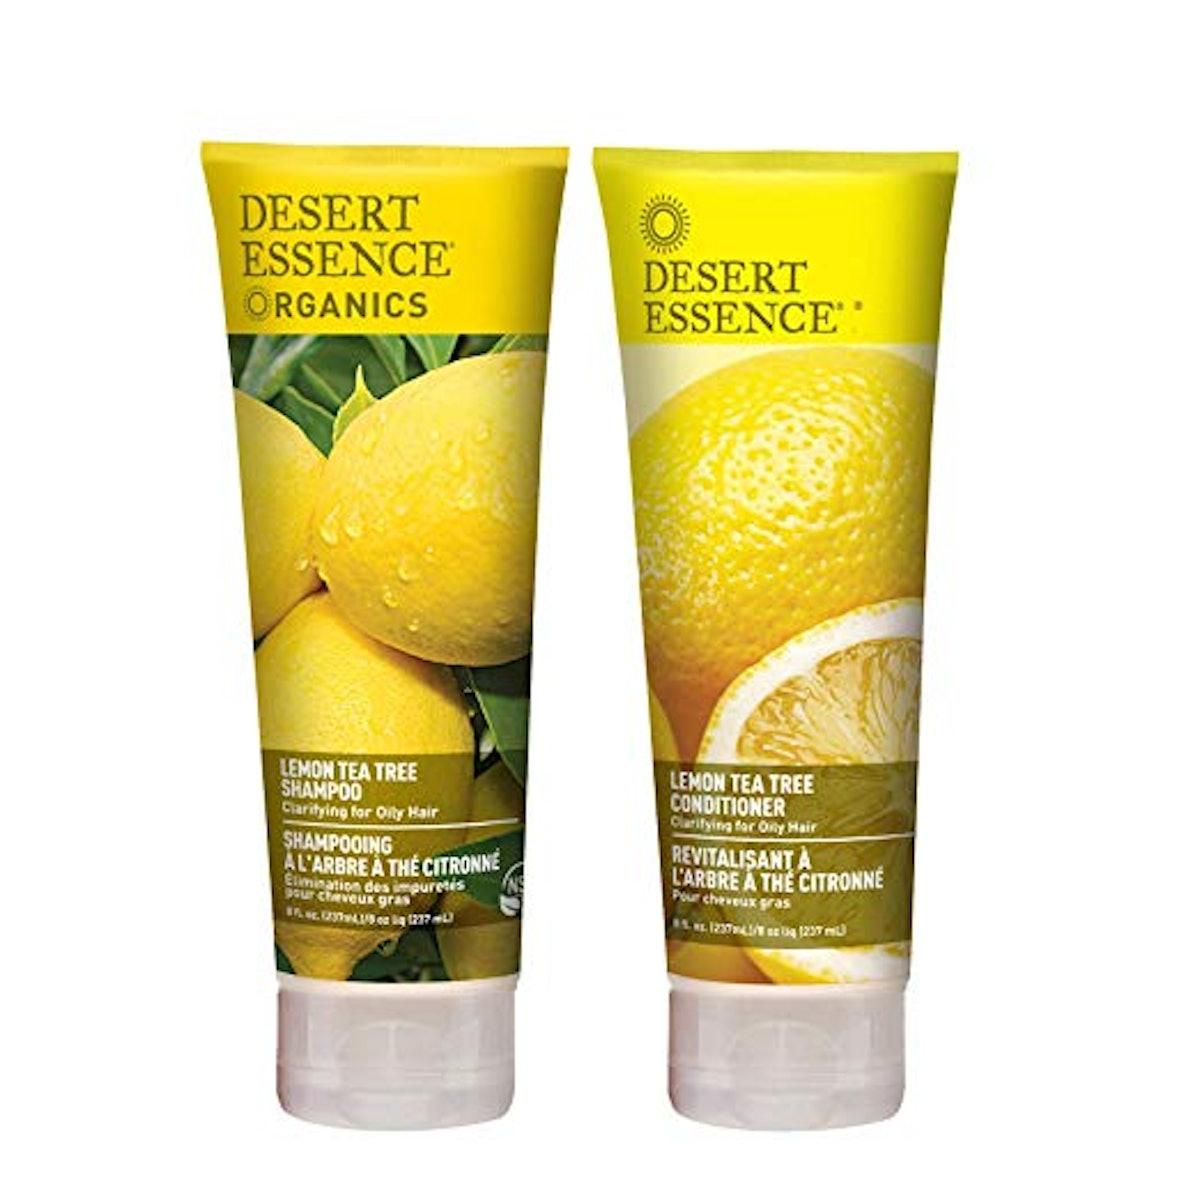 Desert Essence Lemon Tea Tree Shampoo & Conditioner